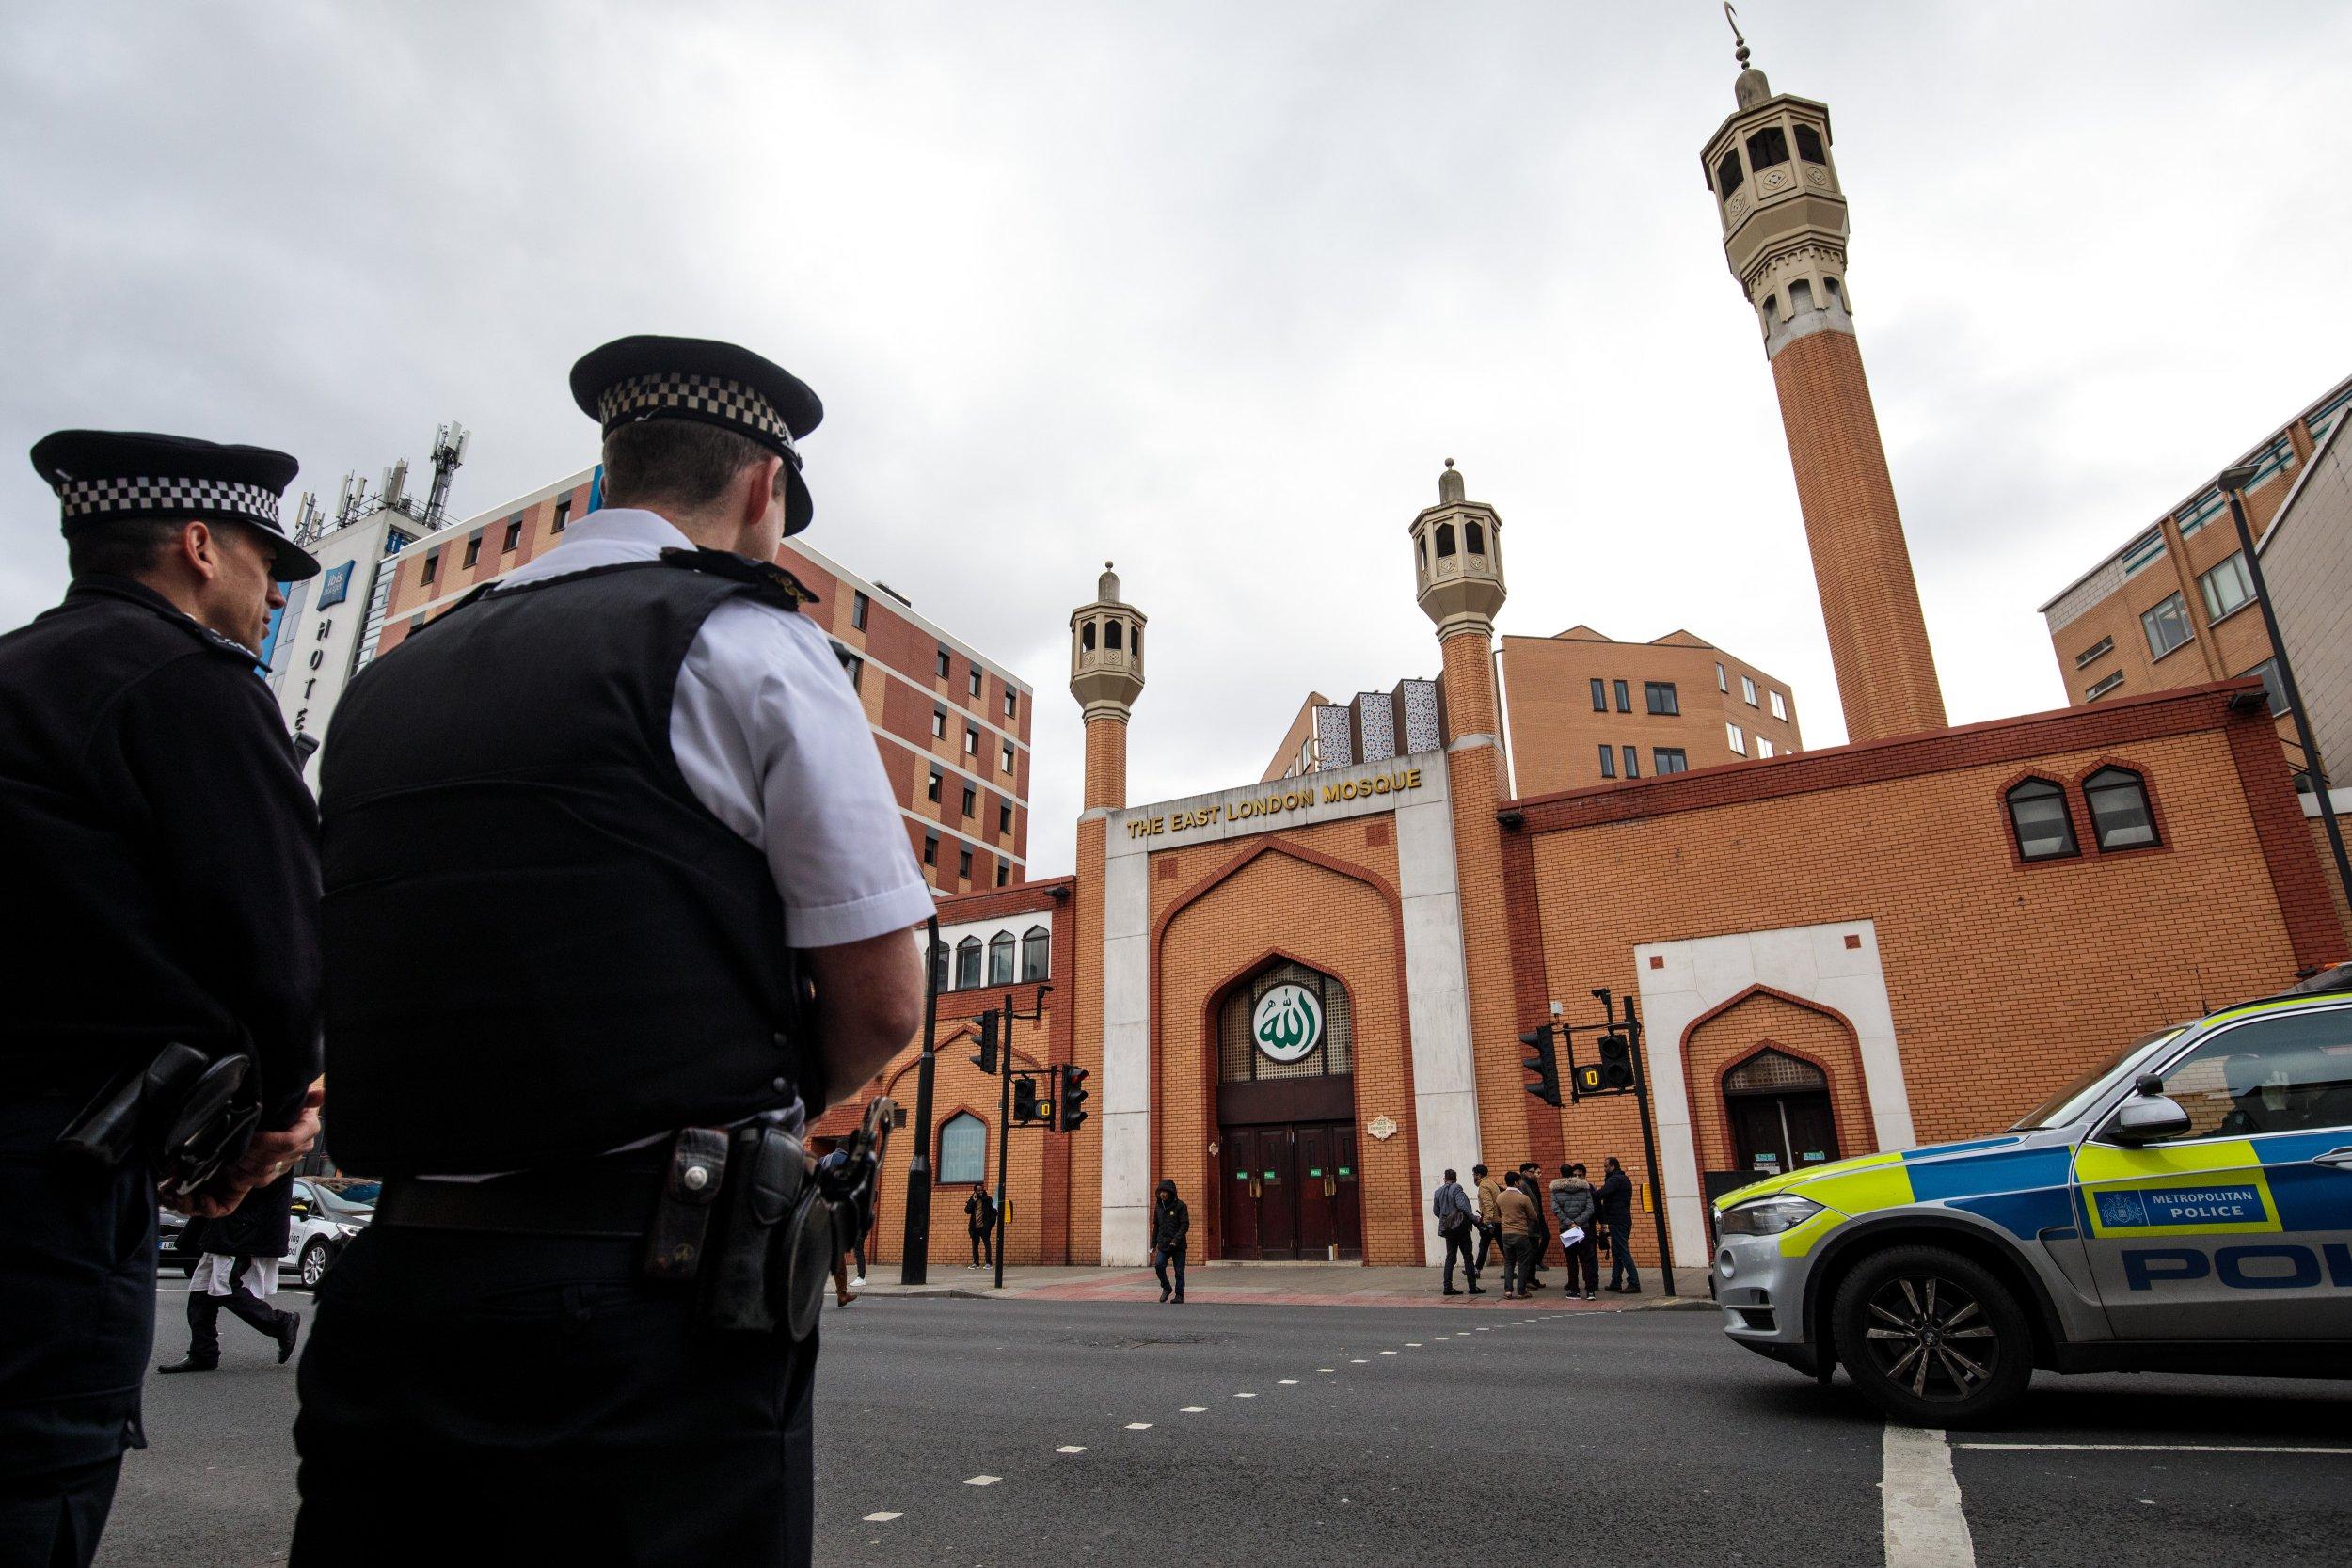 Islamophobic hate crimes in UK soar in wake of New Zealand terror attack